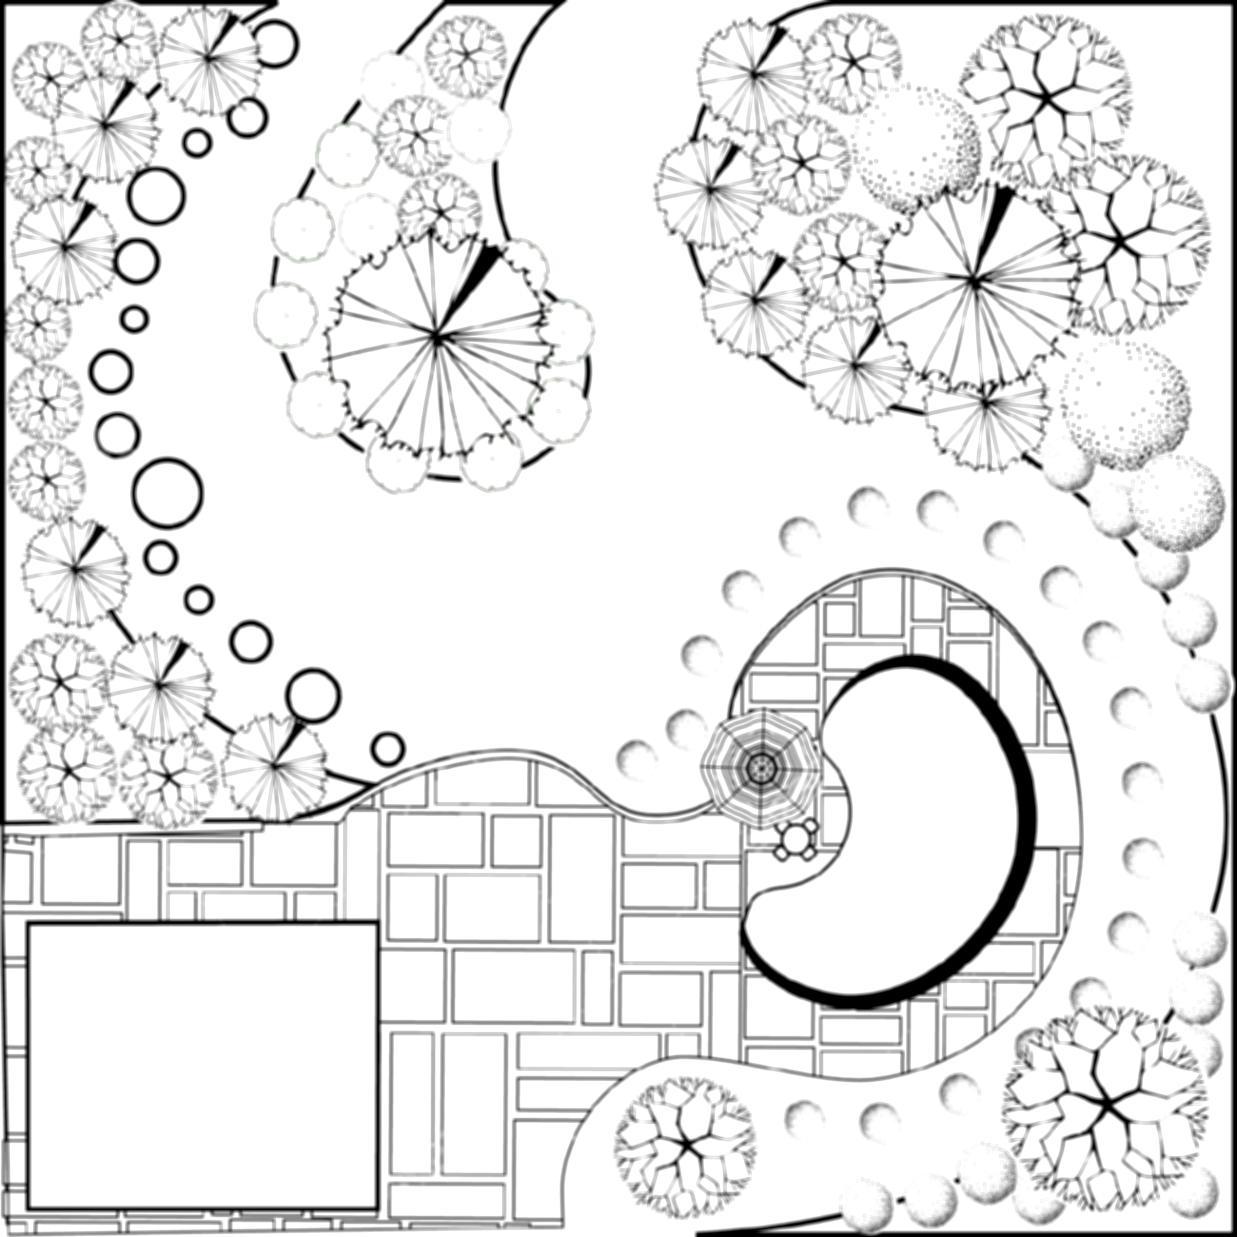 1237x1237 Landscape Design Drawing Carex Group Landscapes Are Us Landscaping